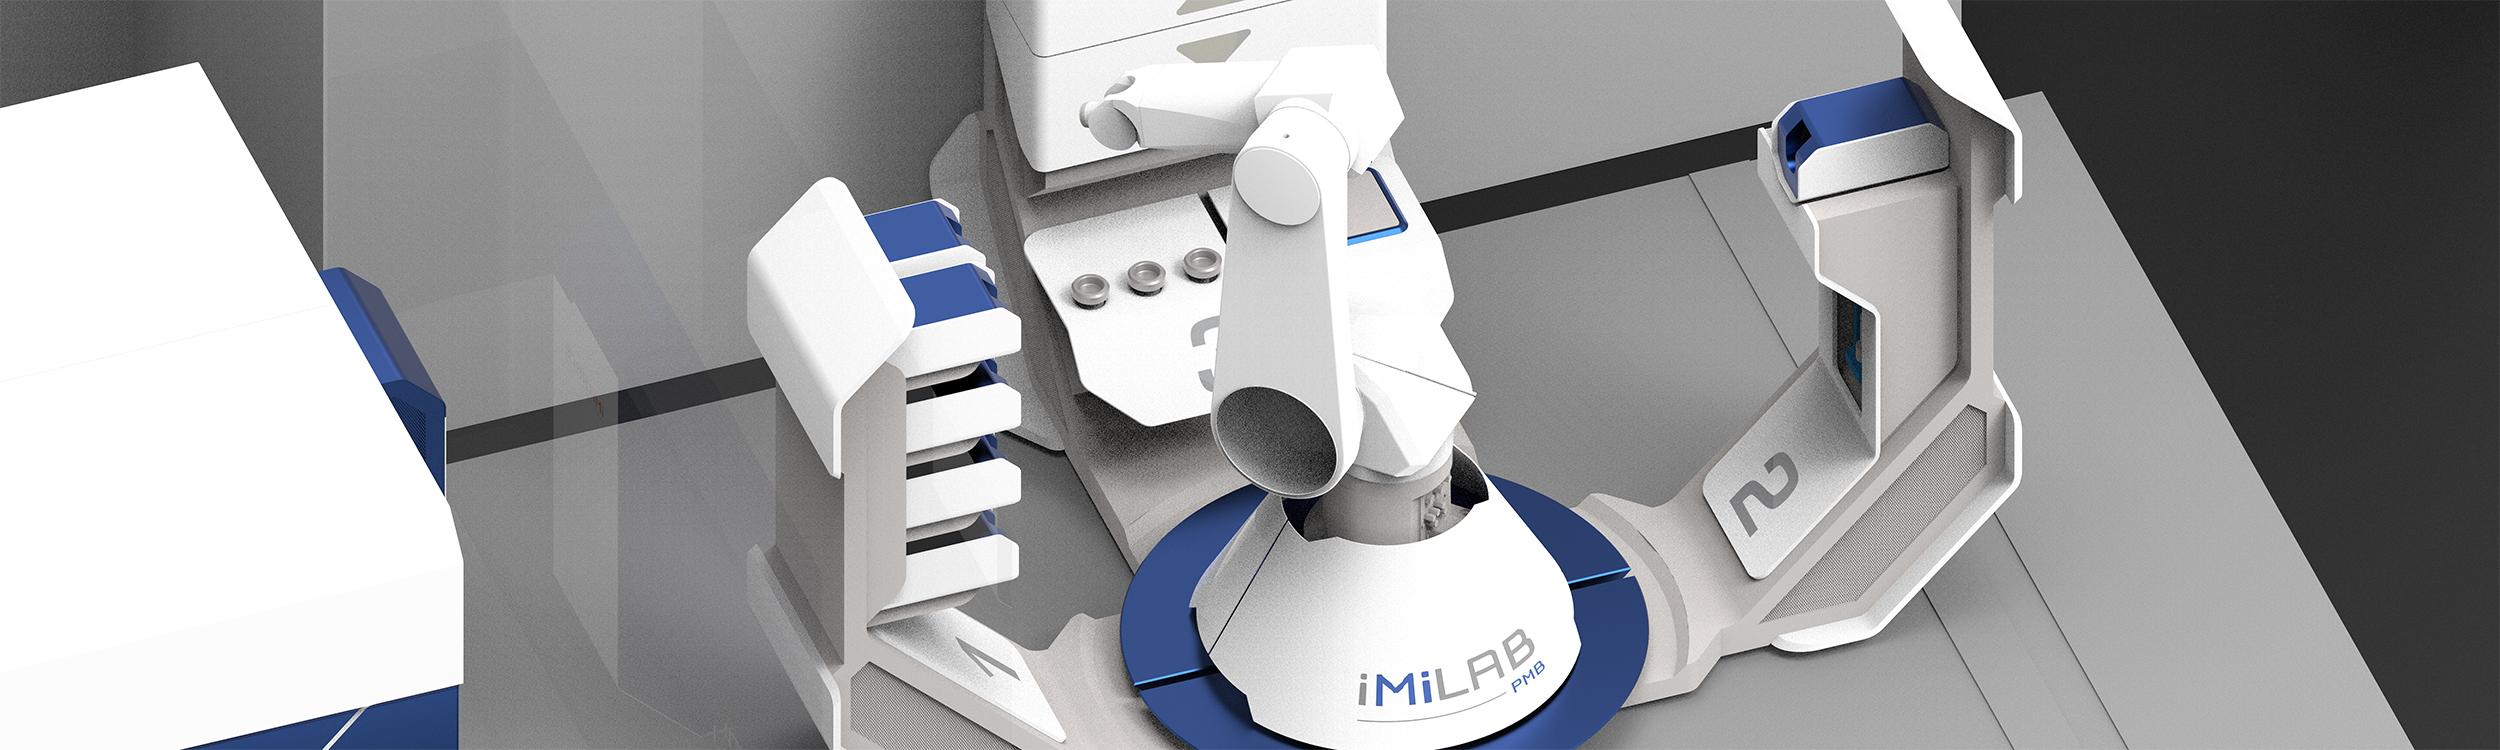 imilab radiochimie microfluidique cassette synthèse radiopharmaceutiques